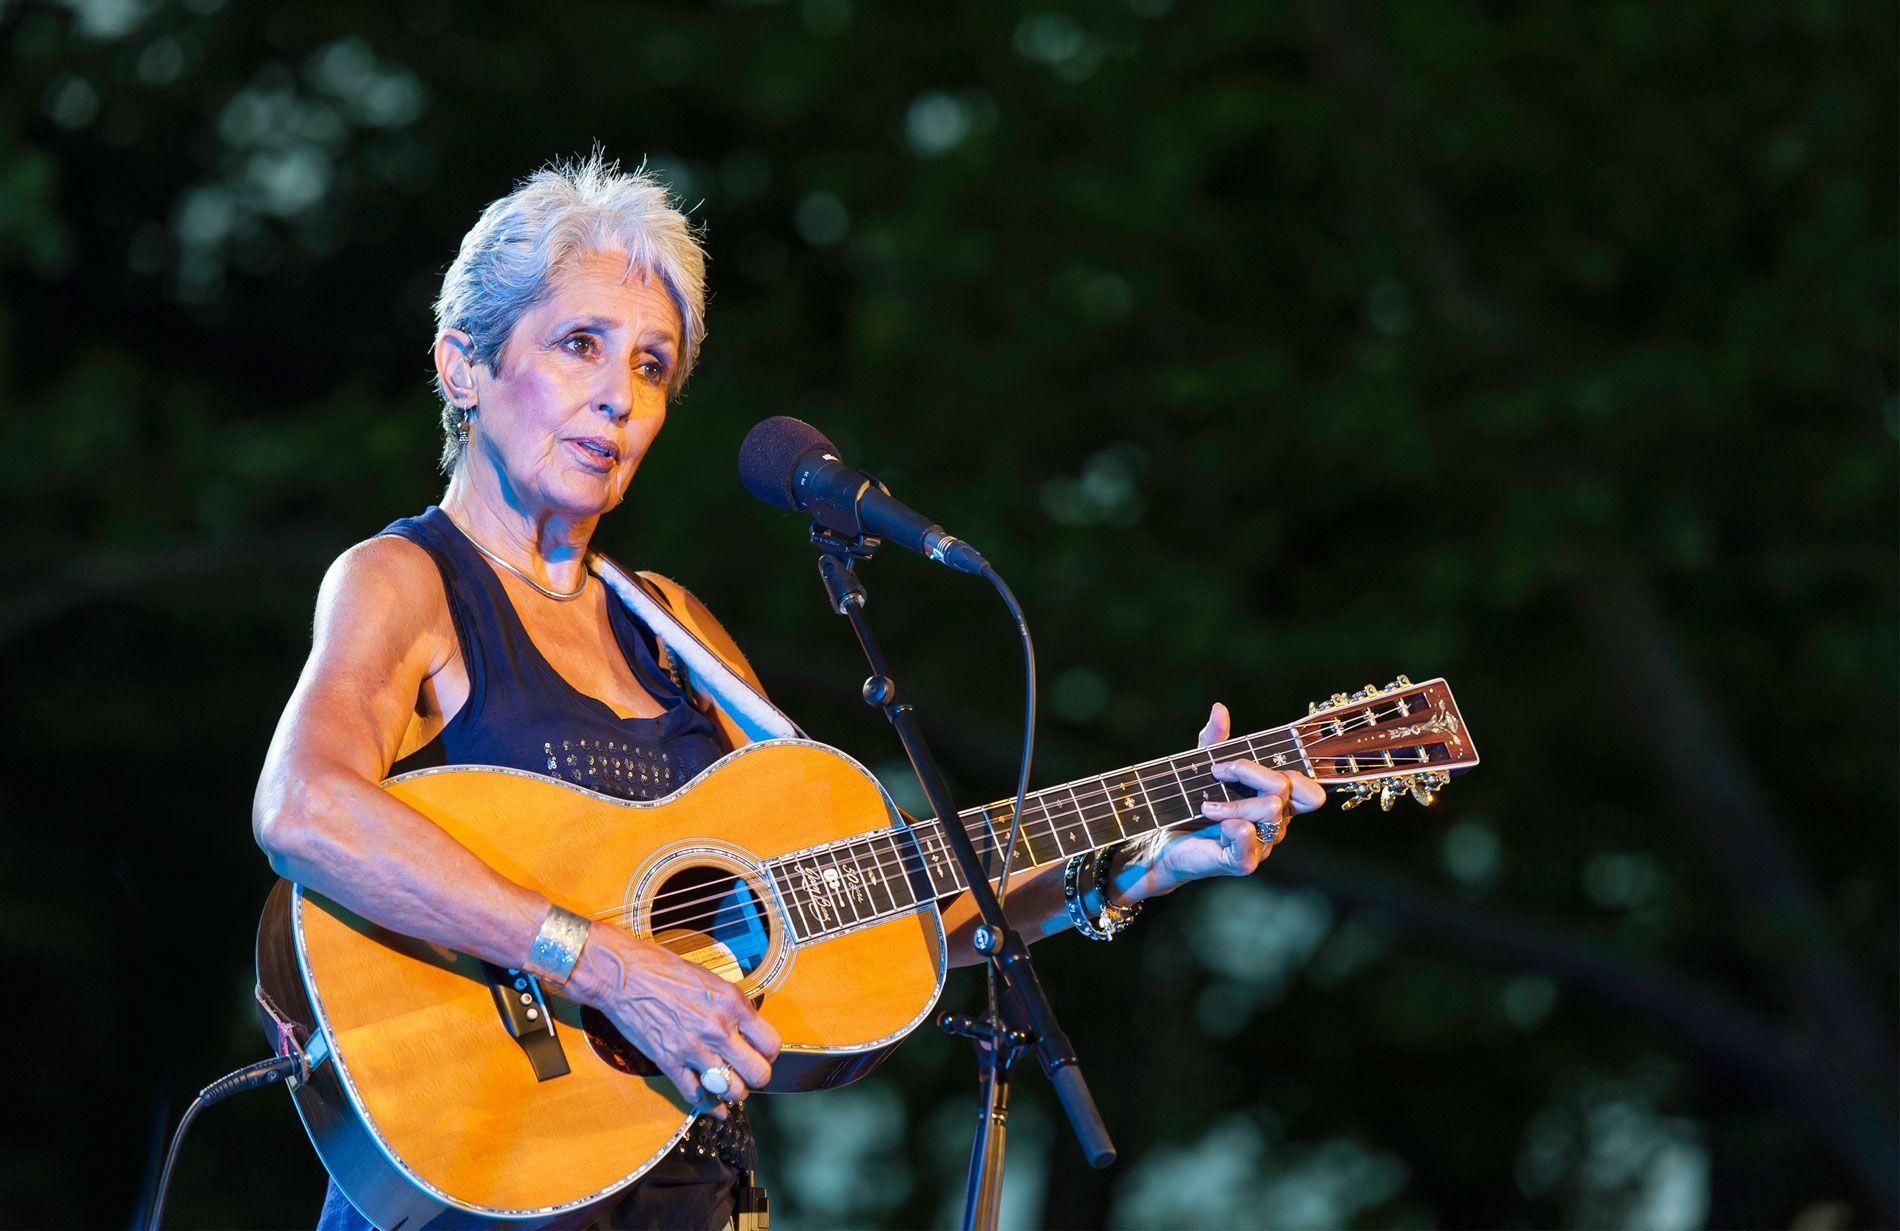 The Music Goes On Joan Baezs Latest And Last Album Arrives